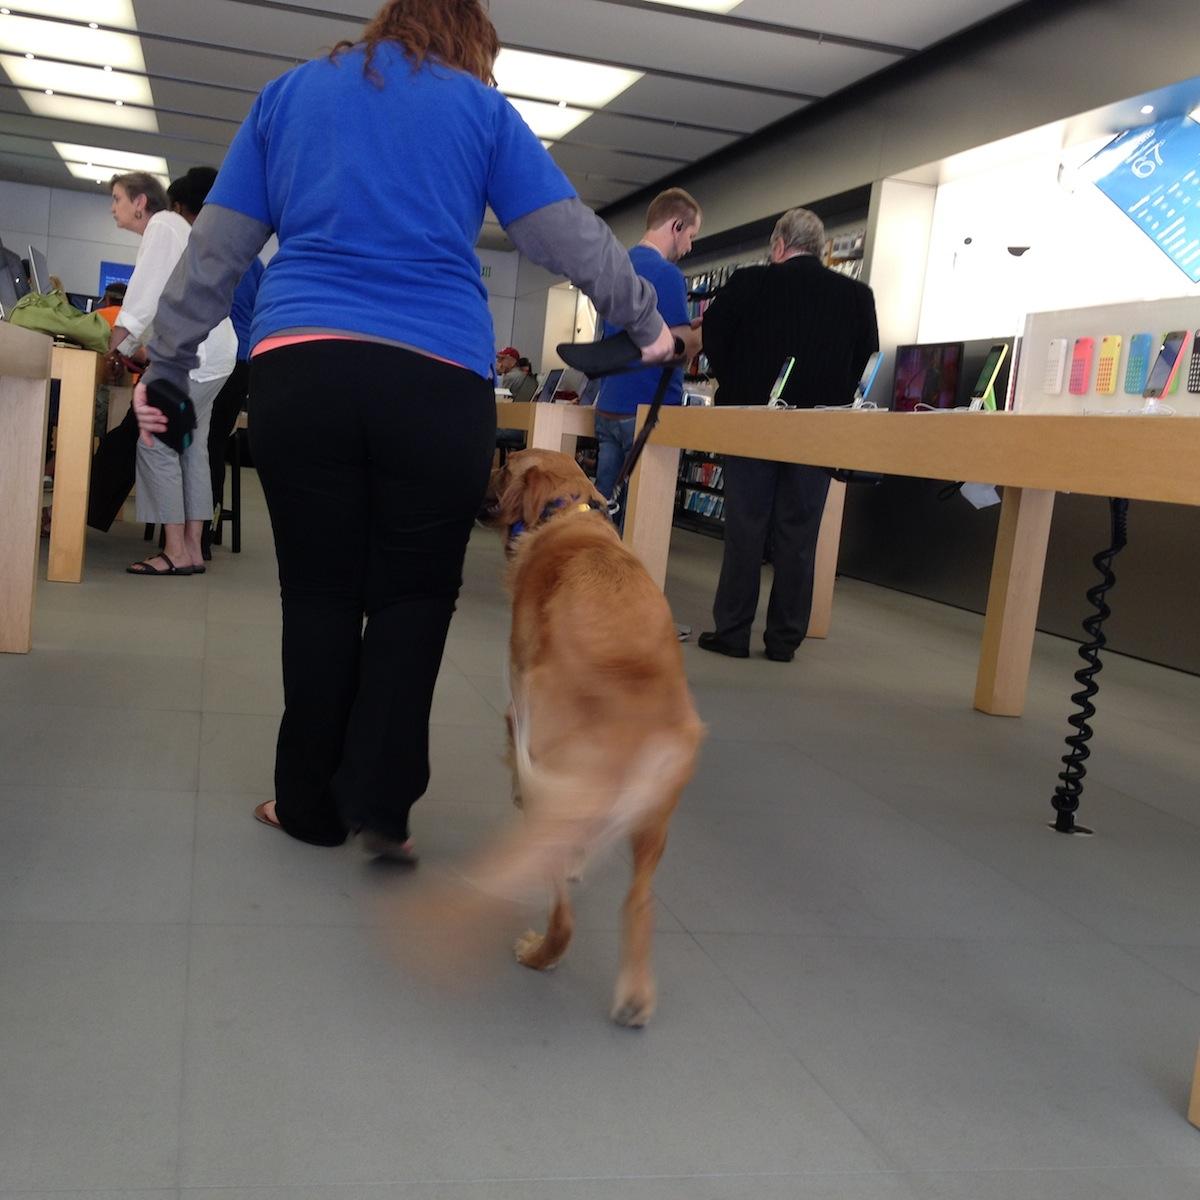 frassie-apple-store2.jpg